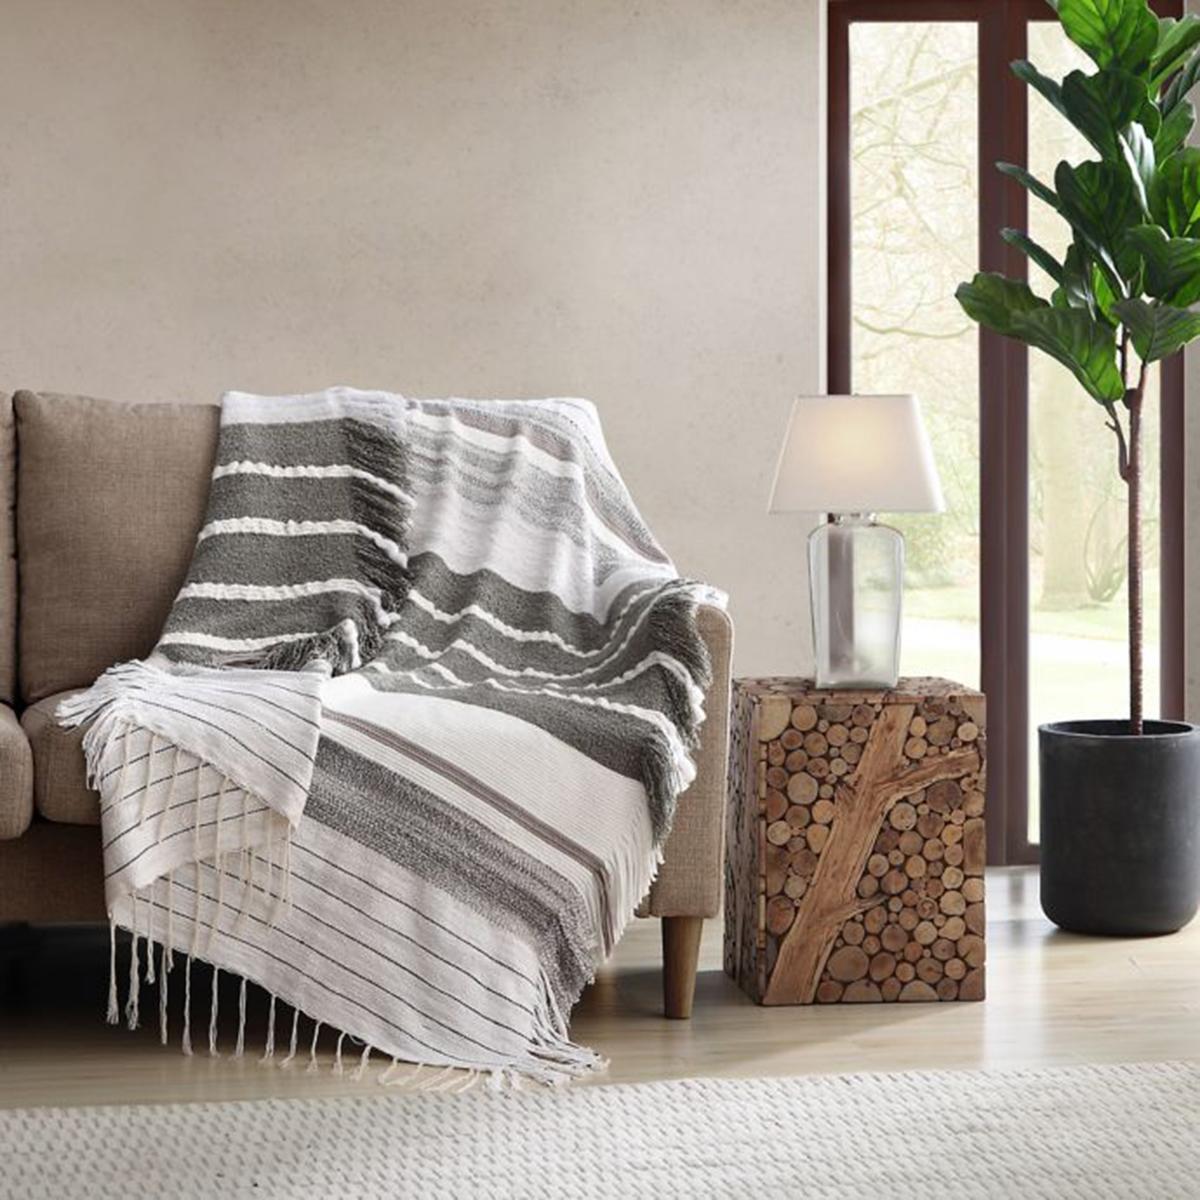 Bw Blanket